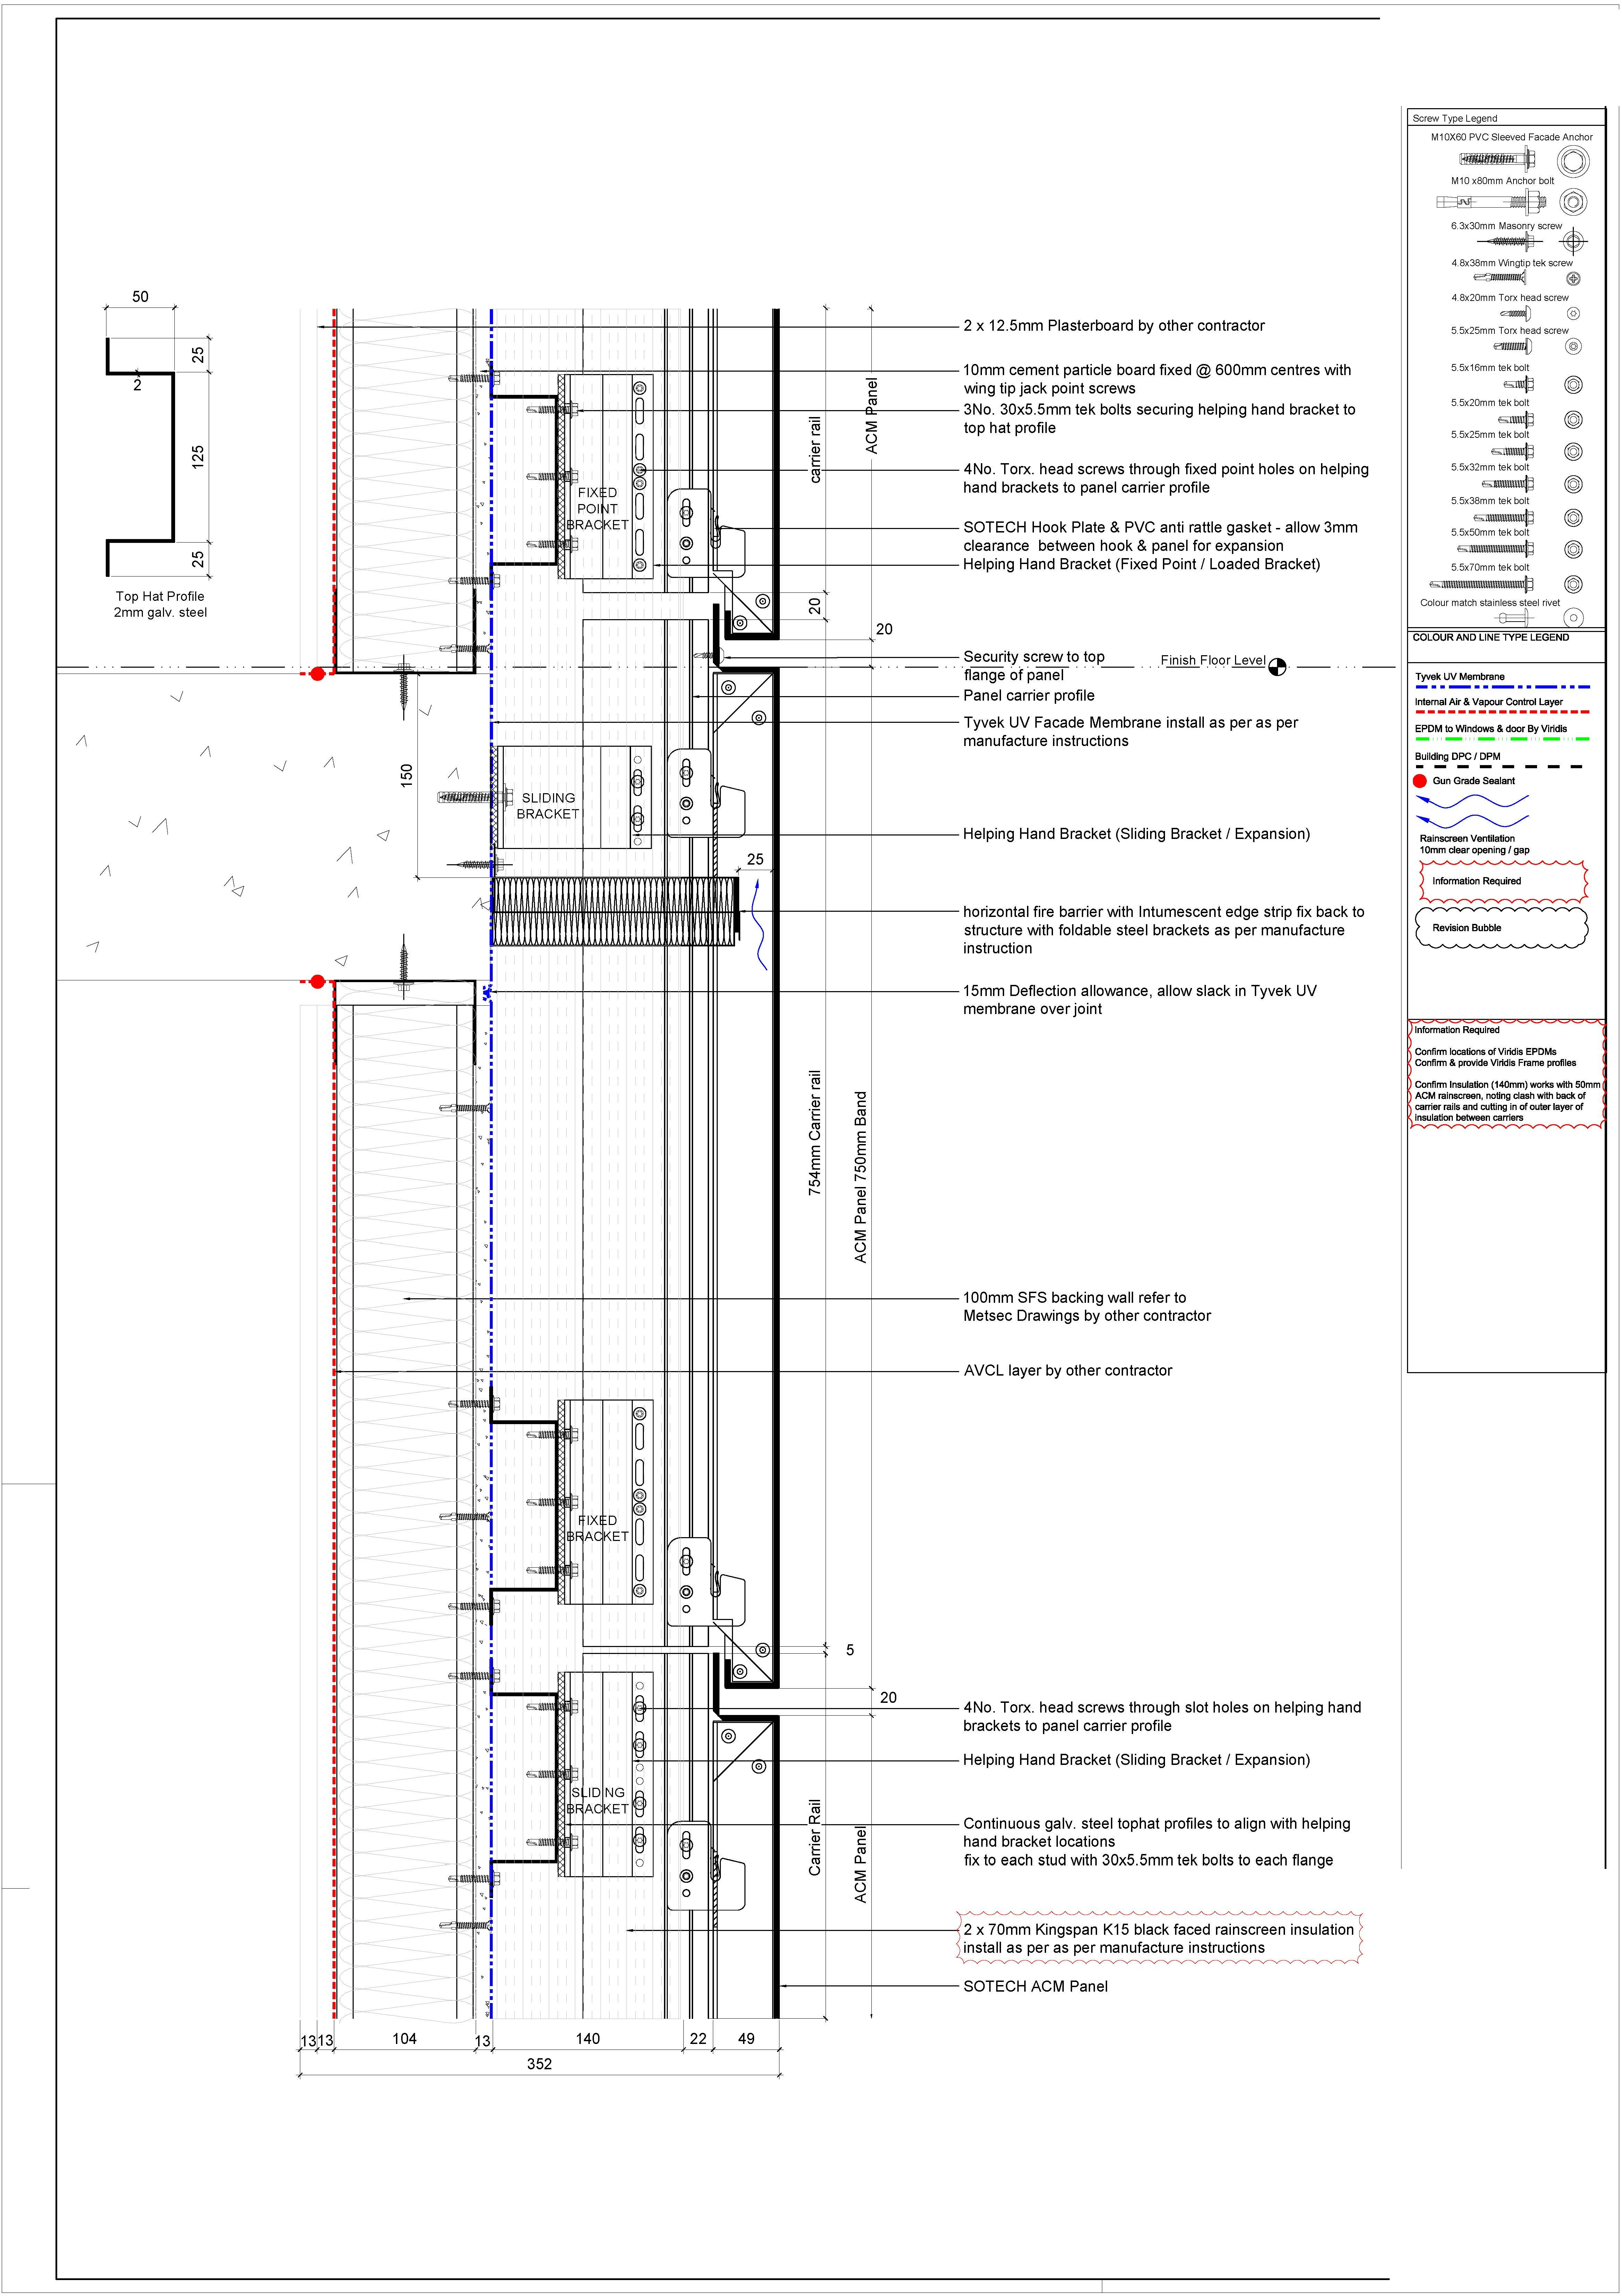 acm panel section